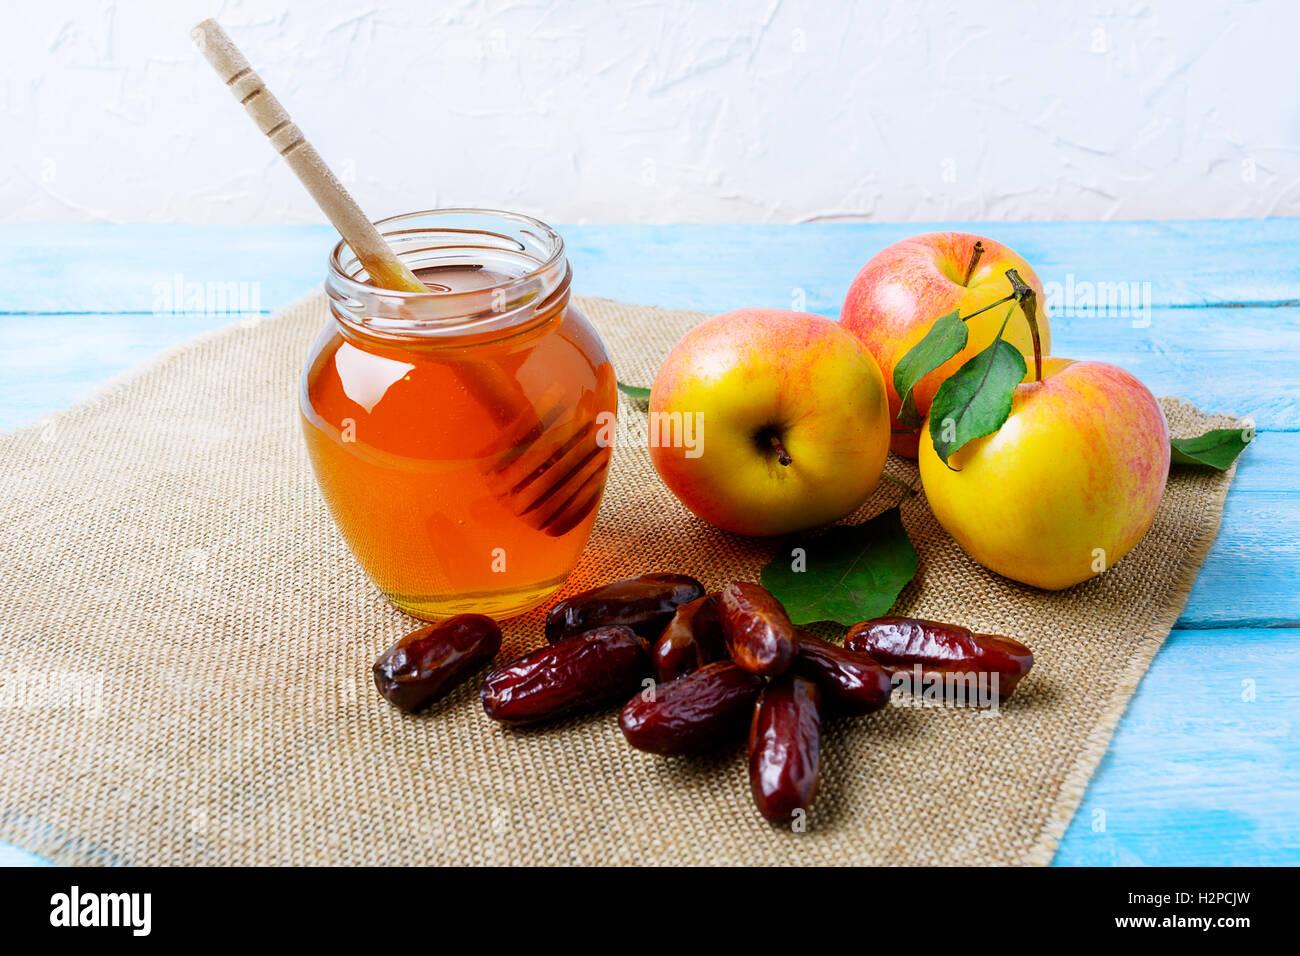 Honey jar dates and apples on burlap napkin rosh hashanah honey jar dates and apples on burlap napkin rosh hashanah concept jewesh new year symbols biocorpaavc